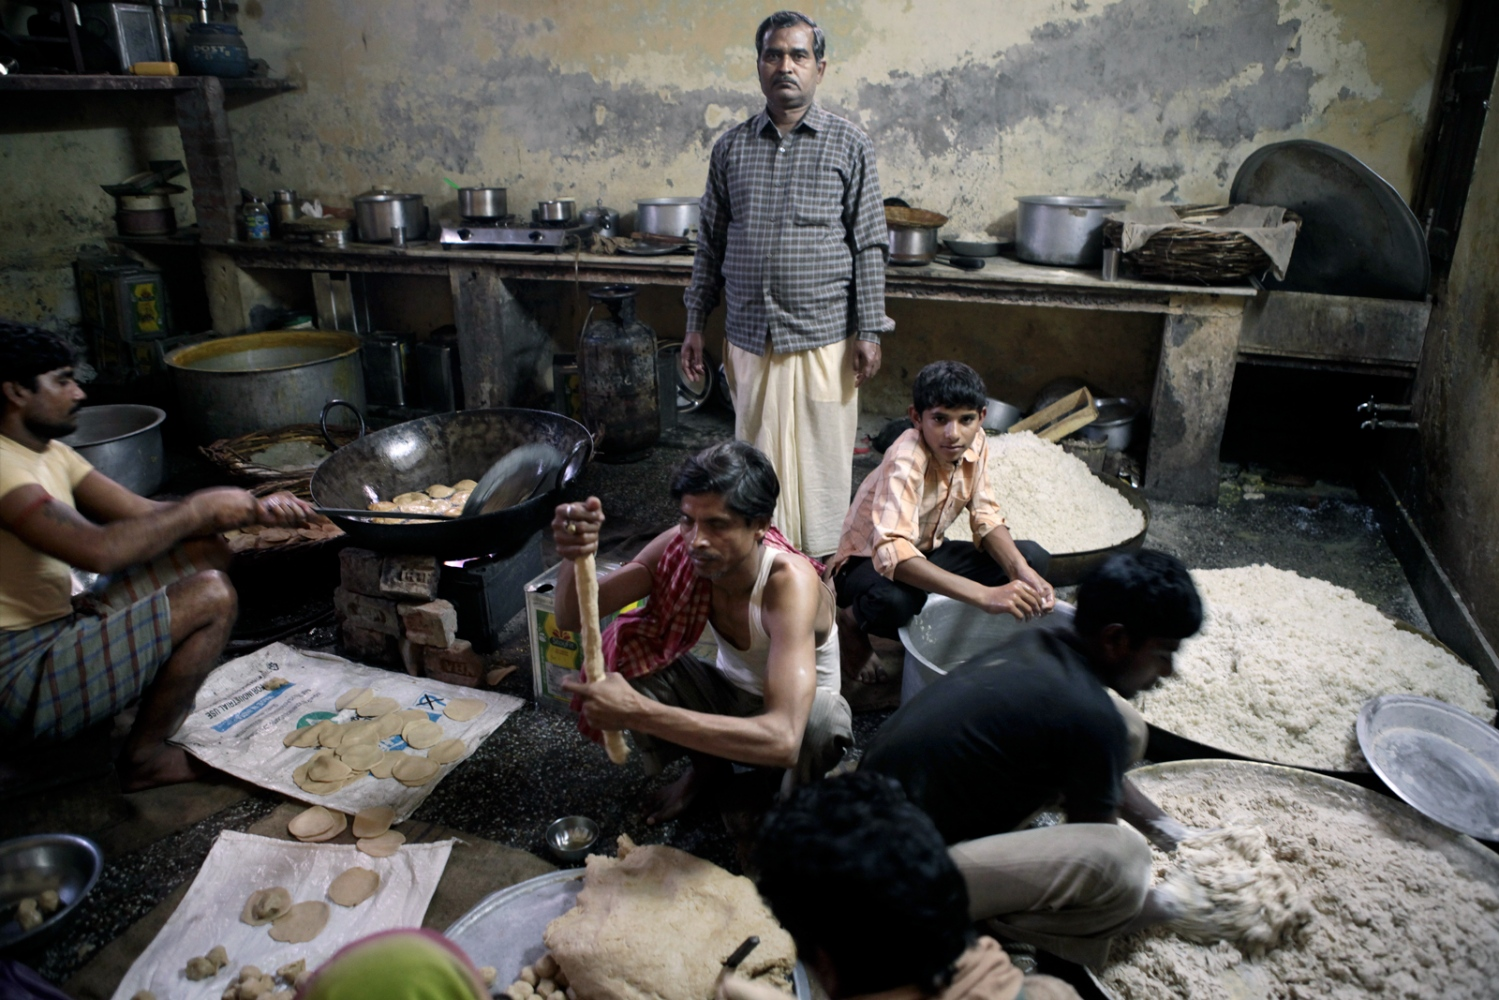 The cooks prepared 350 warm lunches per day.